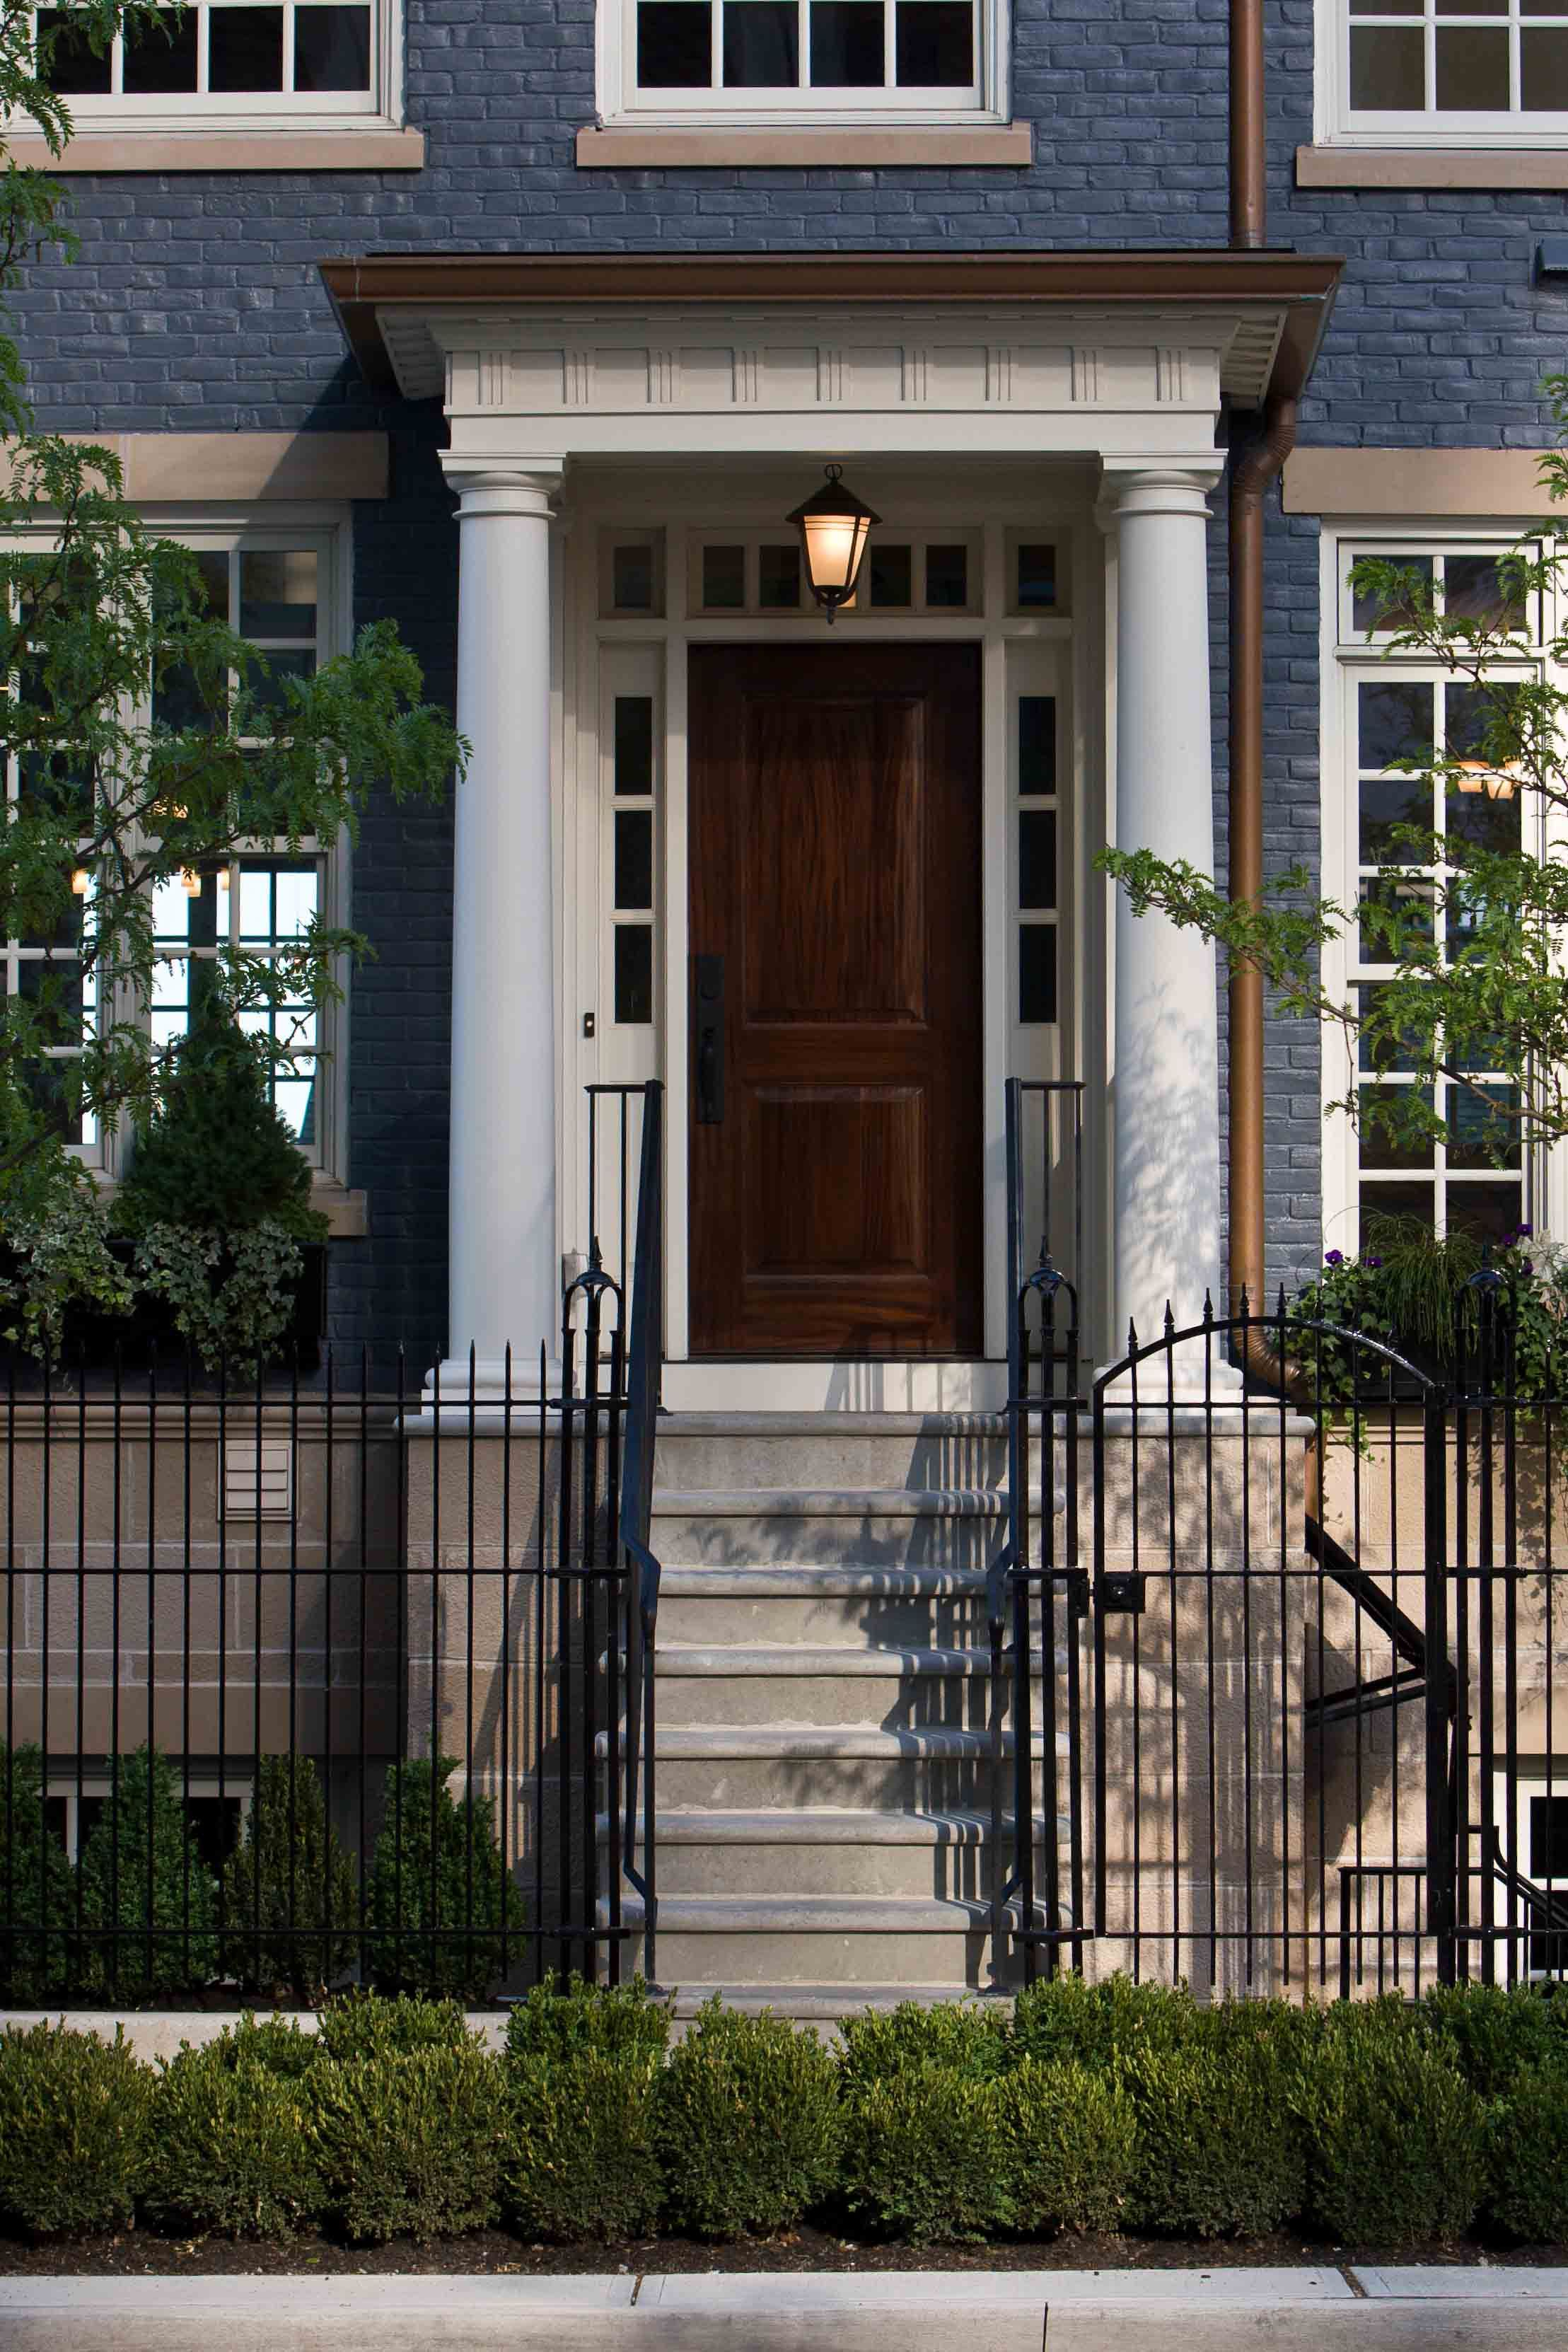 DSCN5103 All Finished | Front porch steps, Front door ... |Wood Stoop Construction Ideas